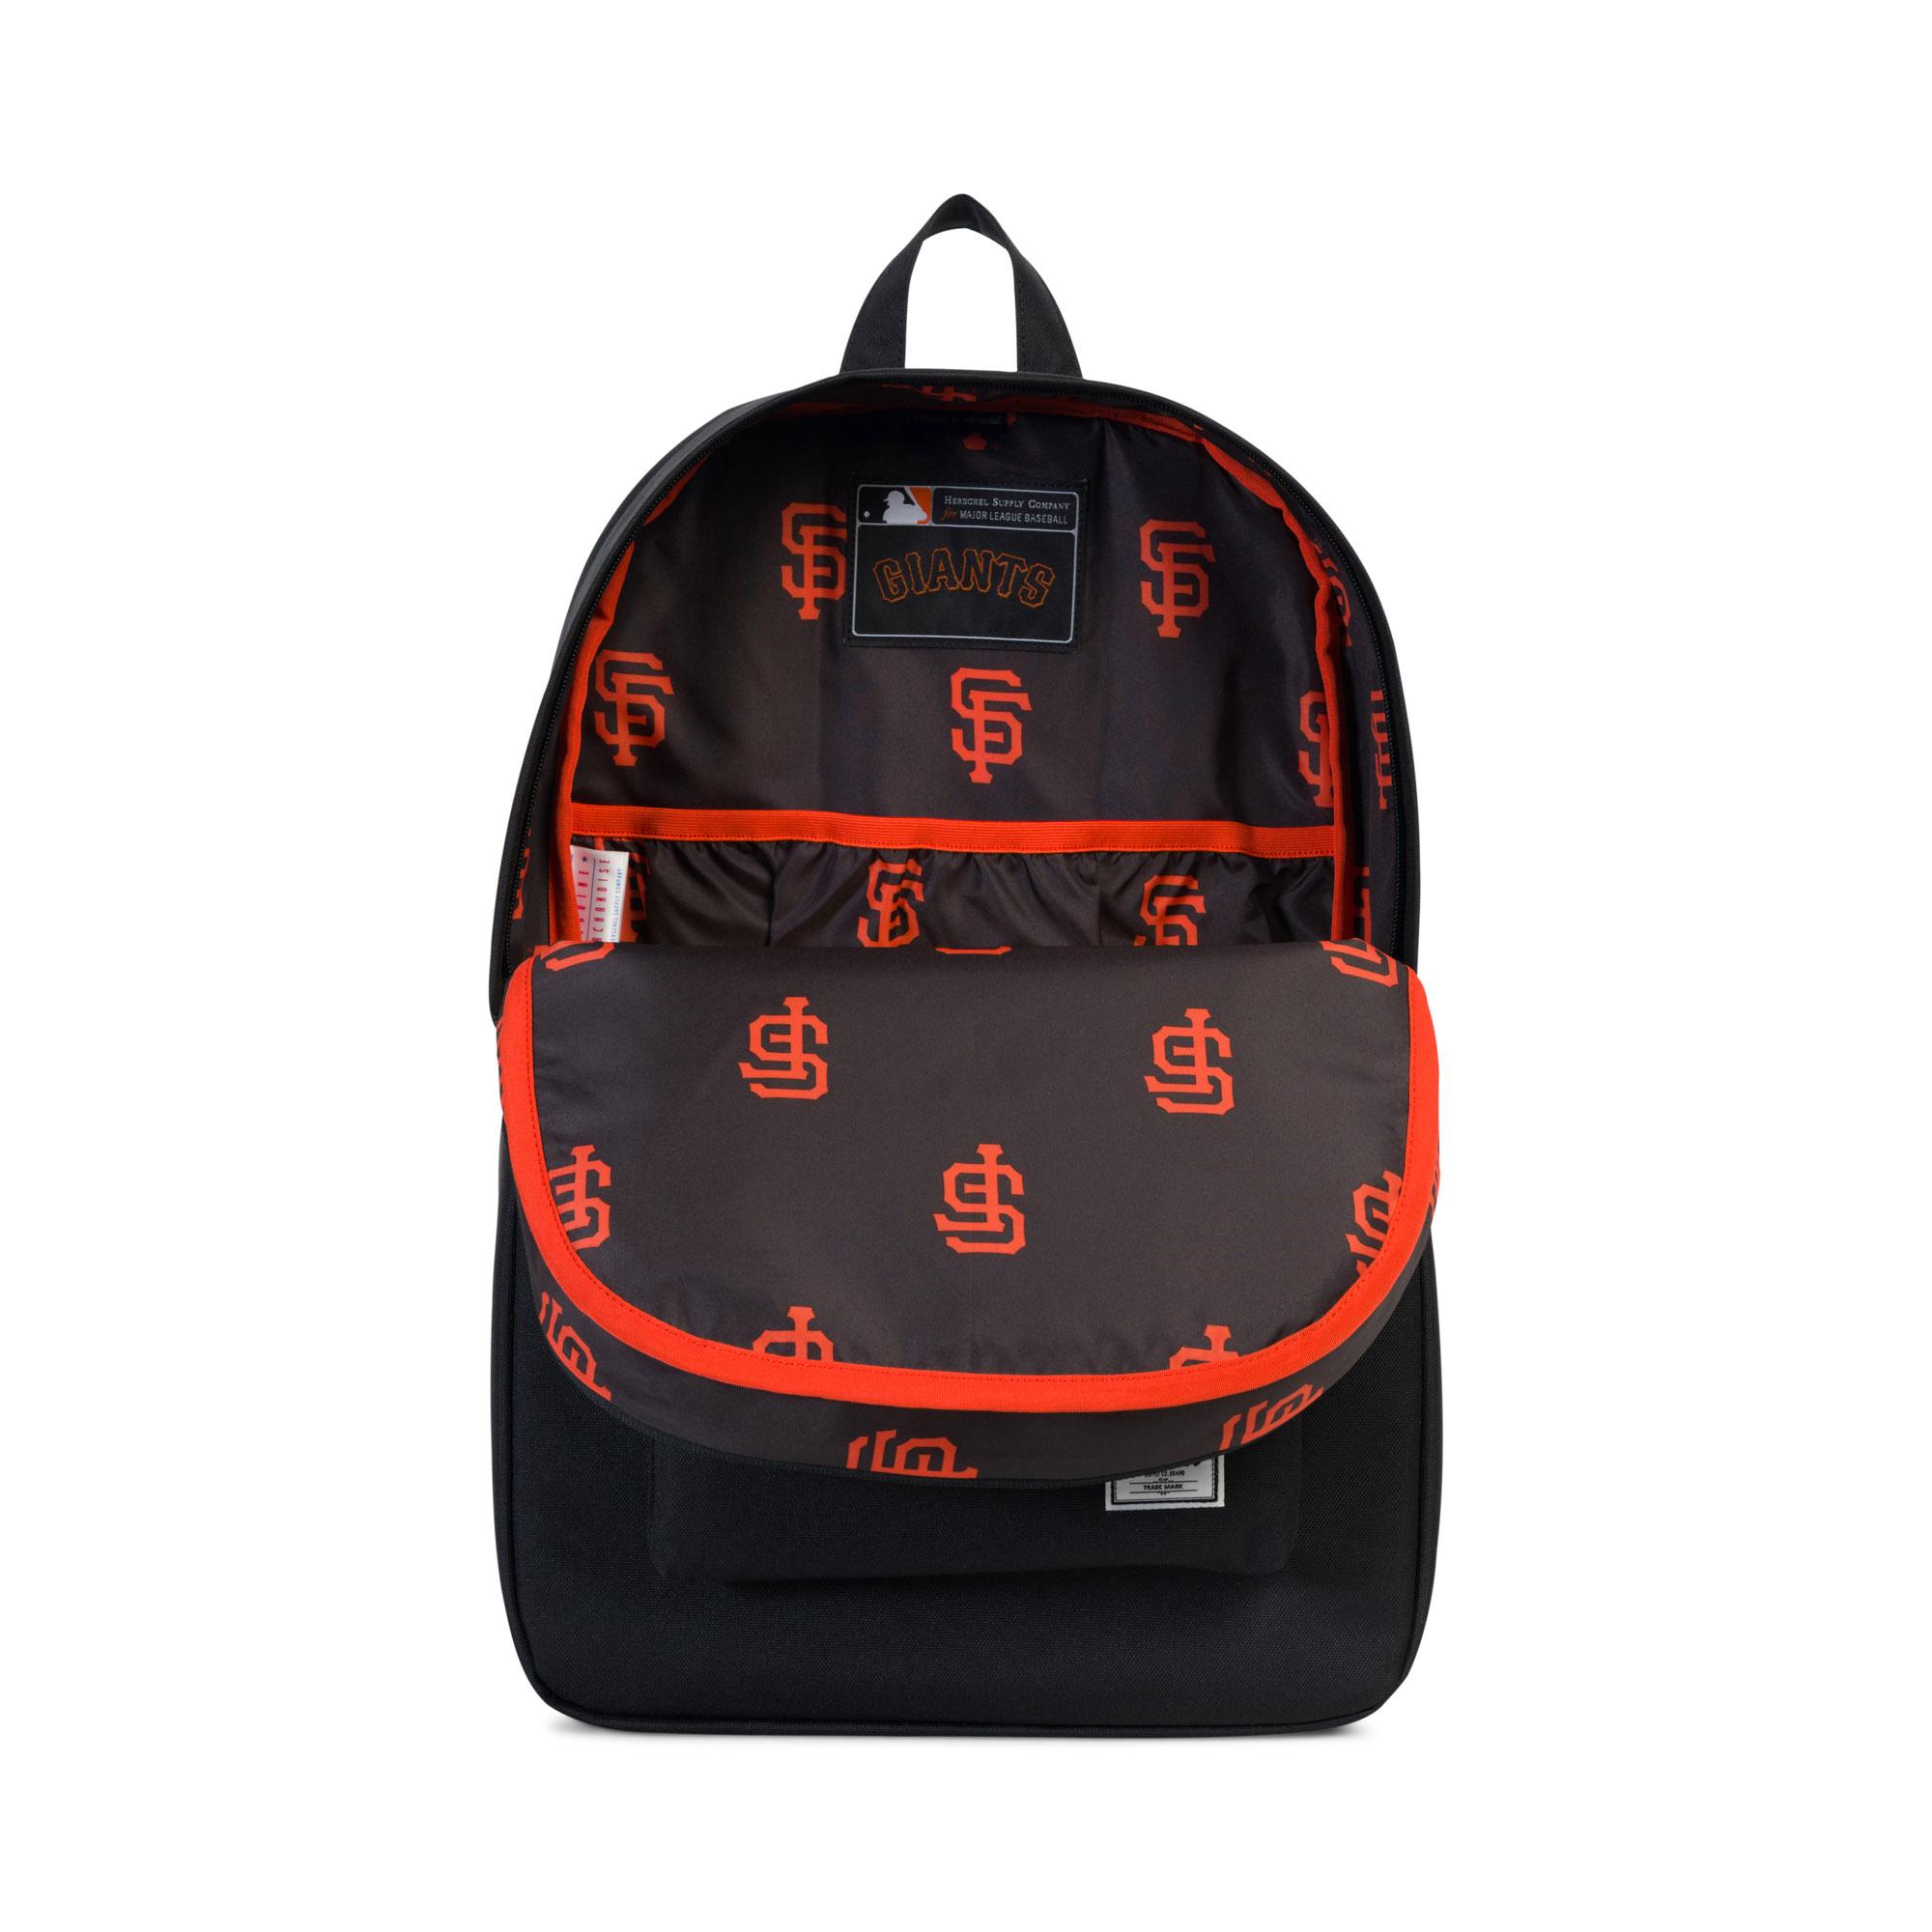 e8d1857fa5 Heritage Backpack